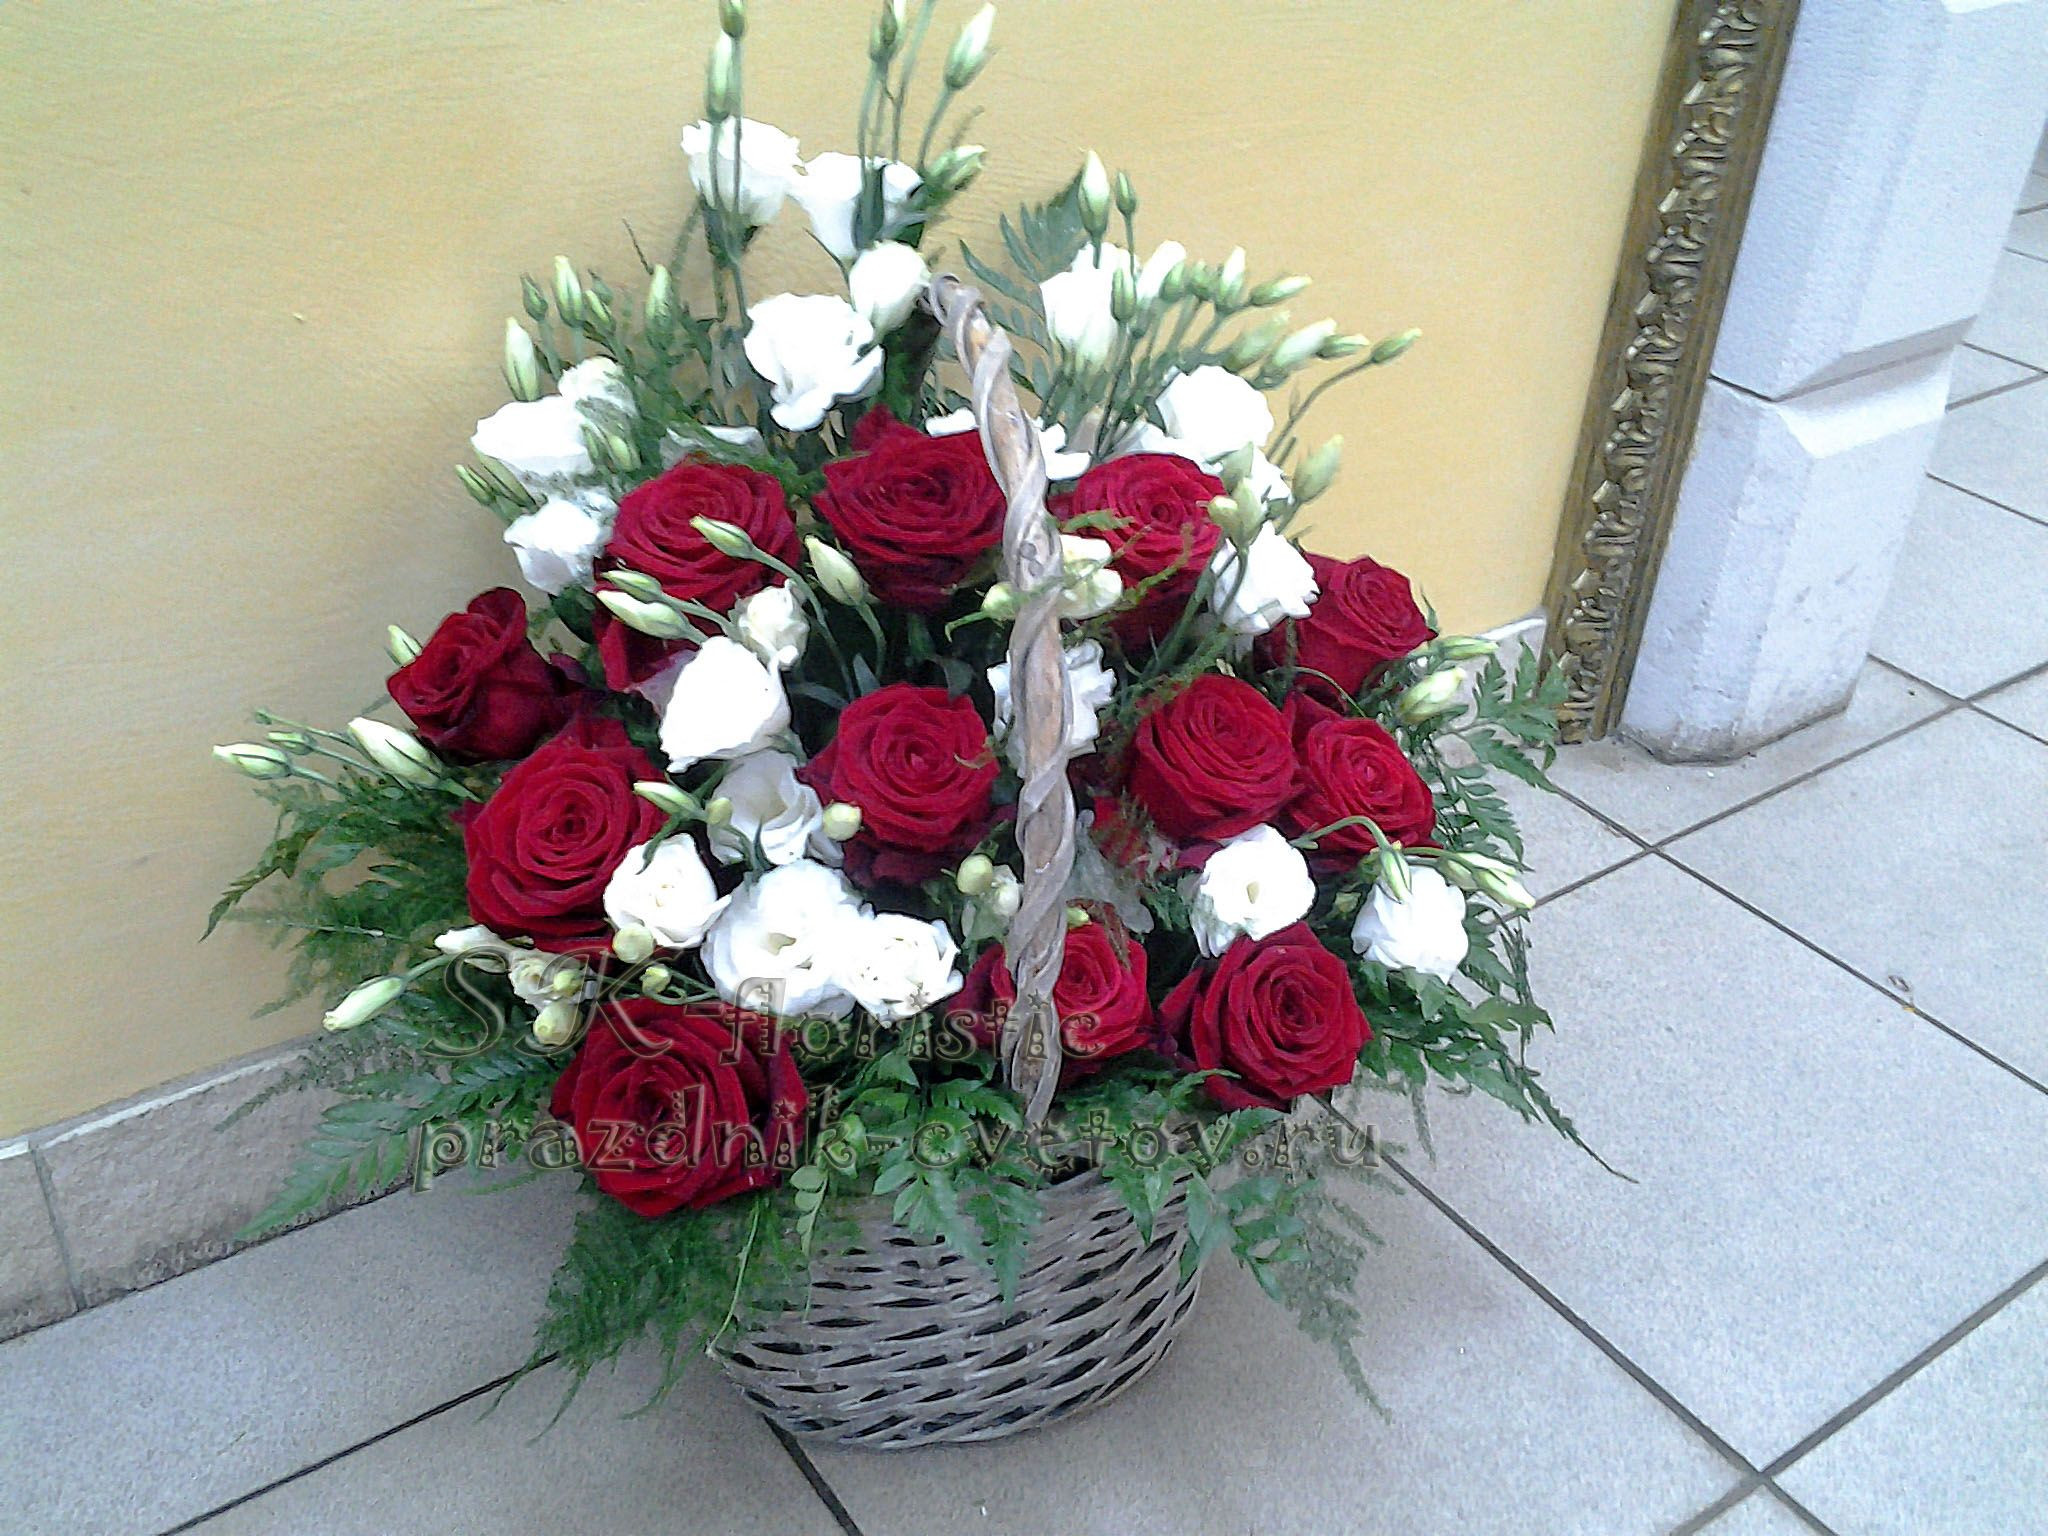 Explore Vo Flower Arrangements and more